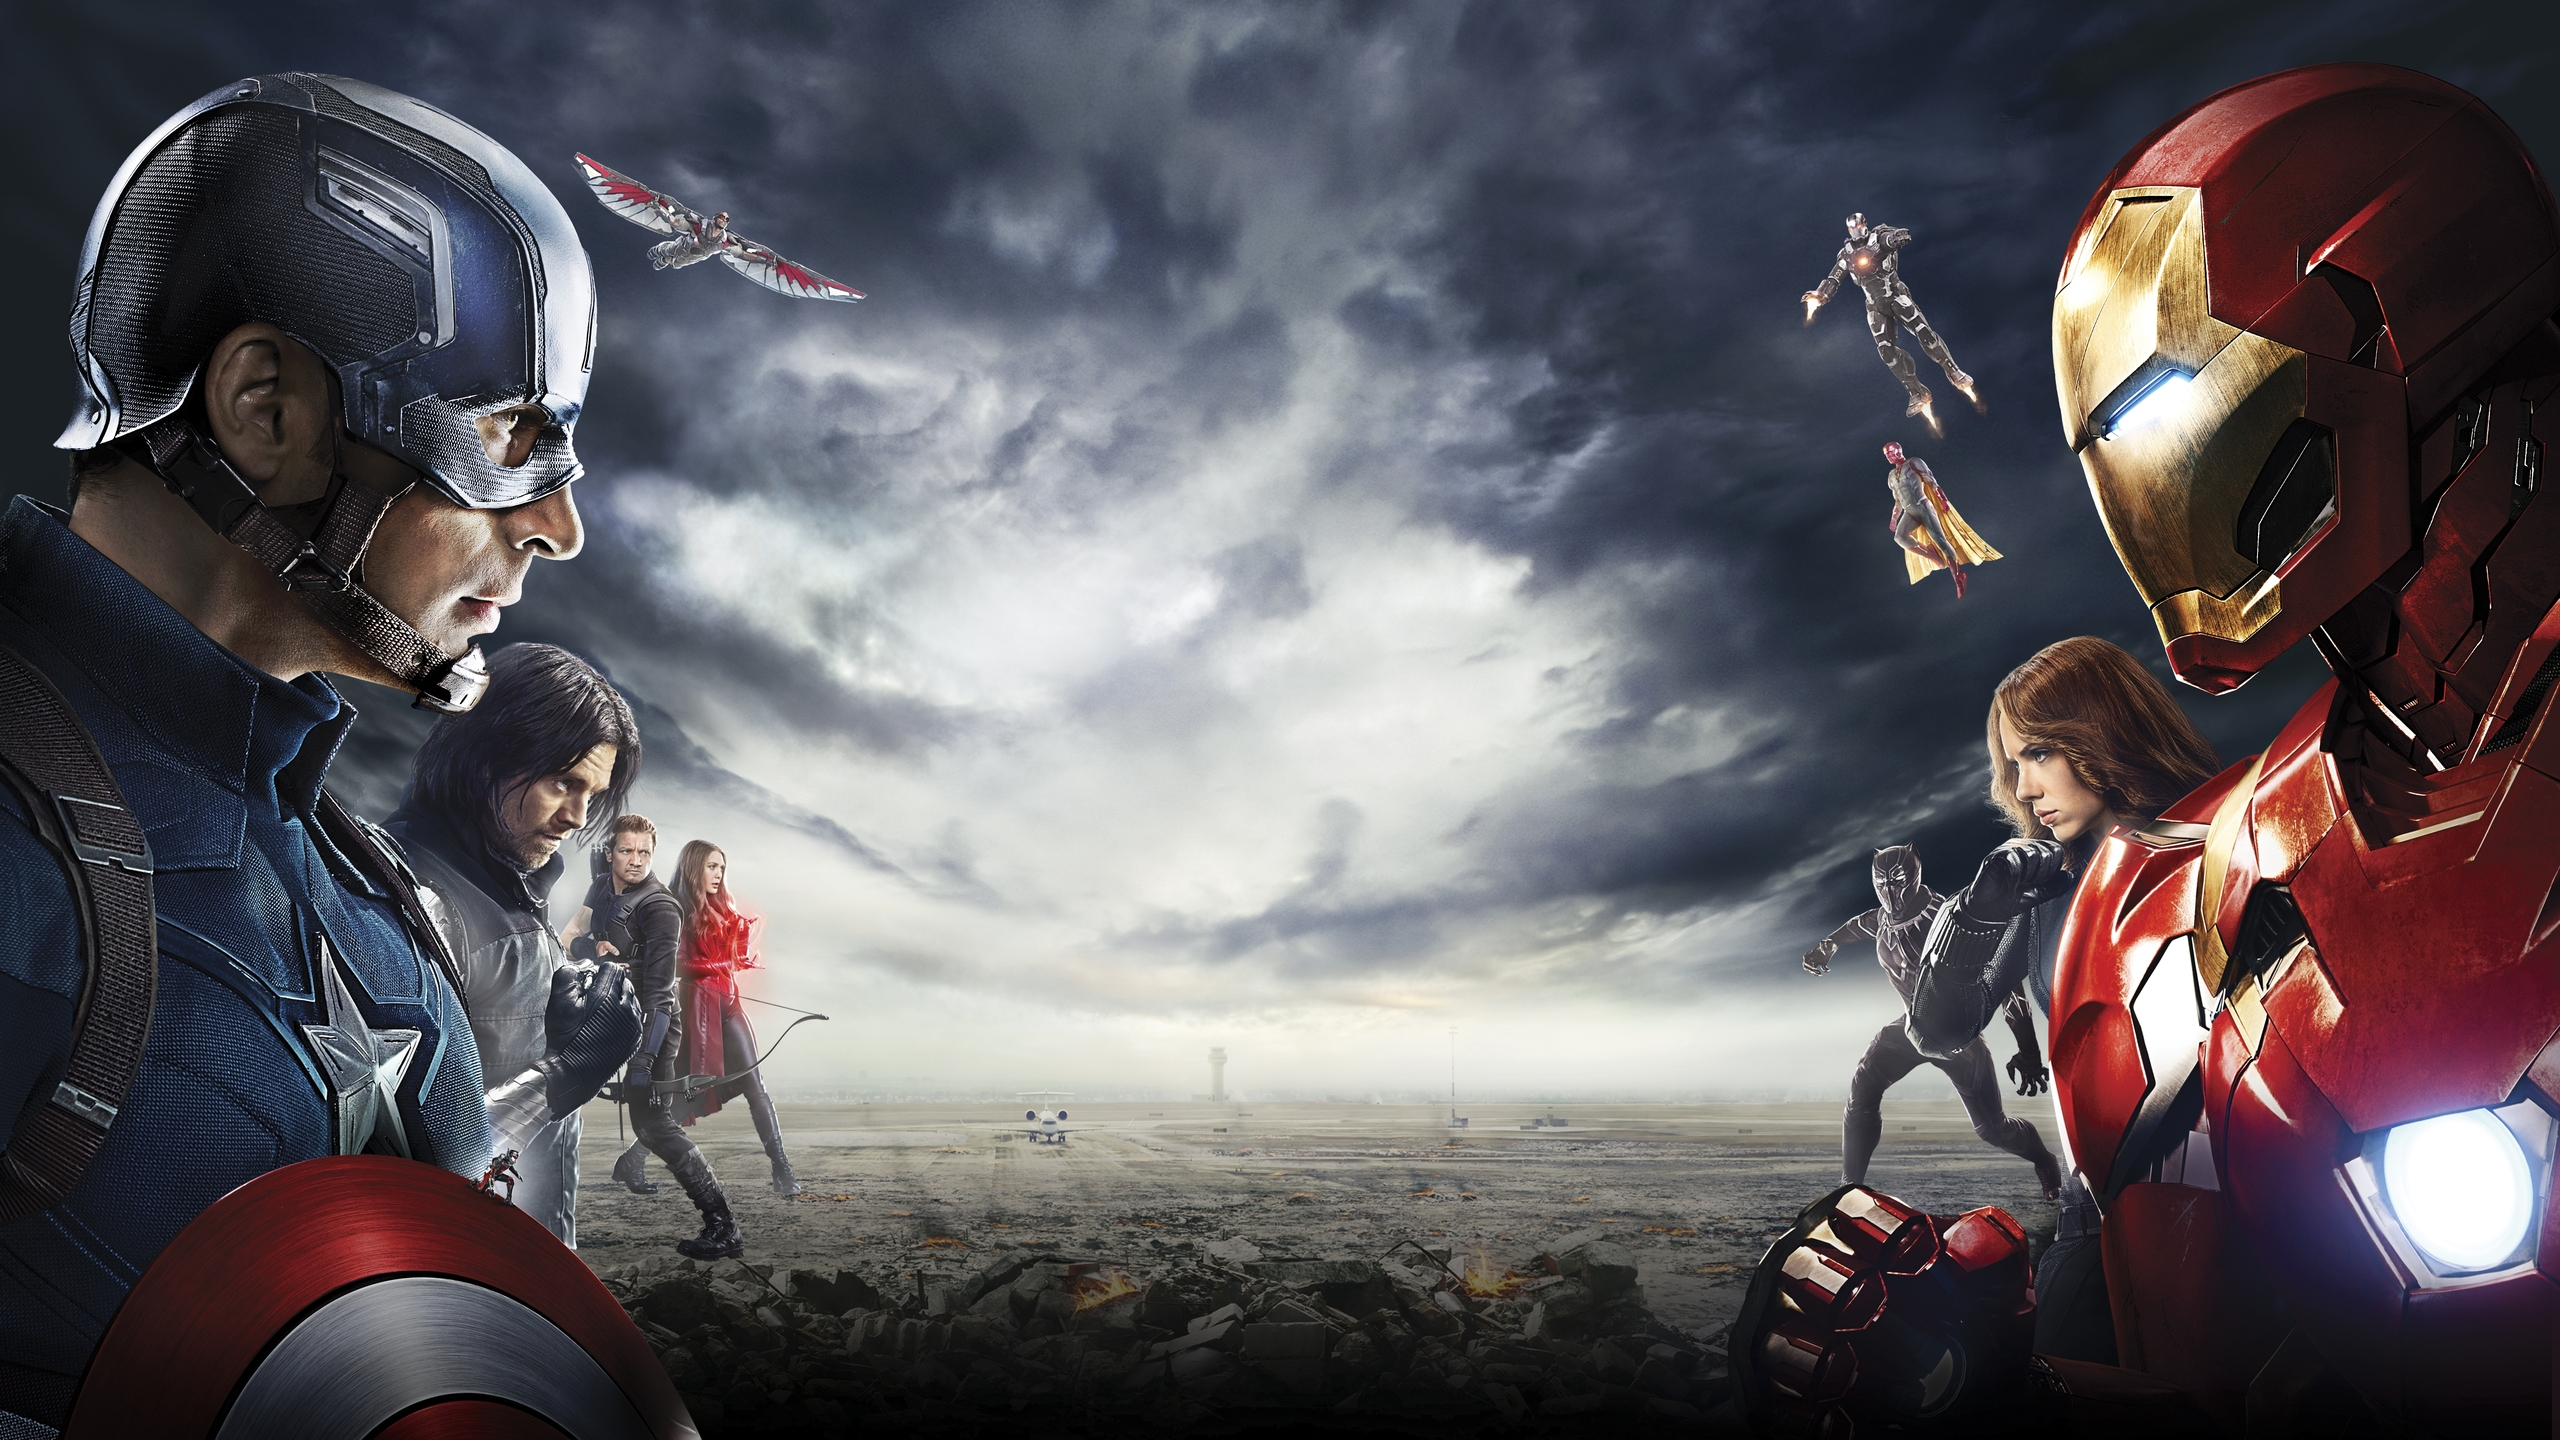 2560x1440 Captain America Civil War Heroes 5k 1440p Resolution Hd